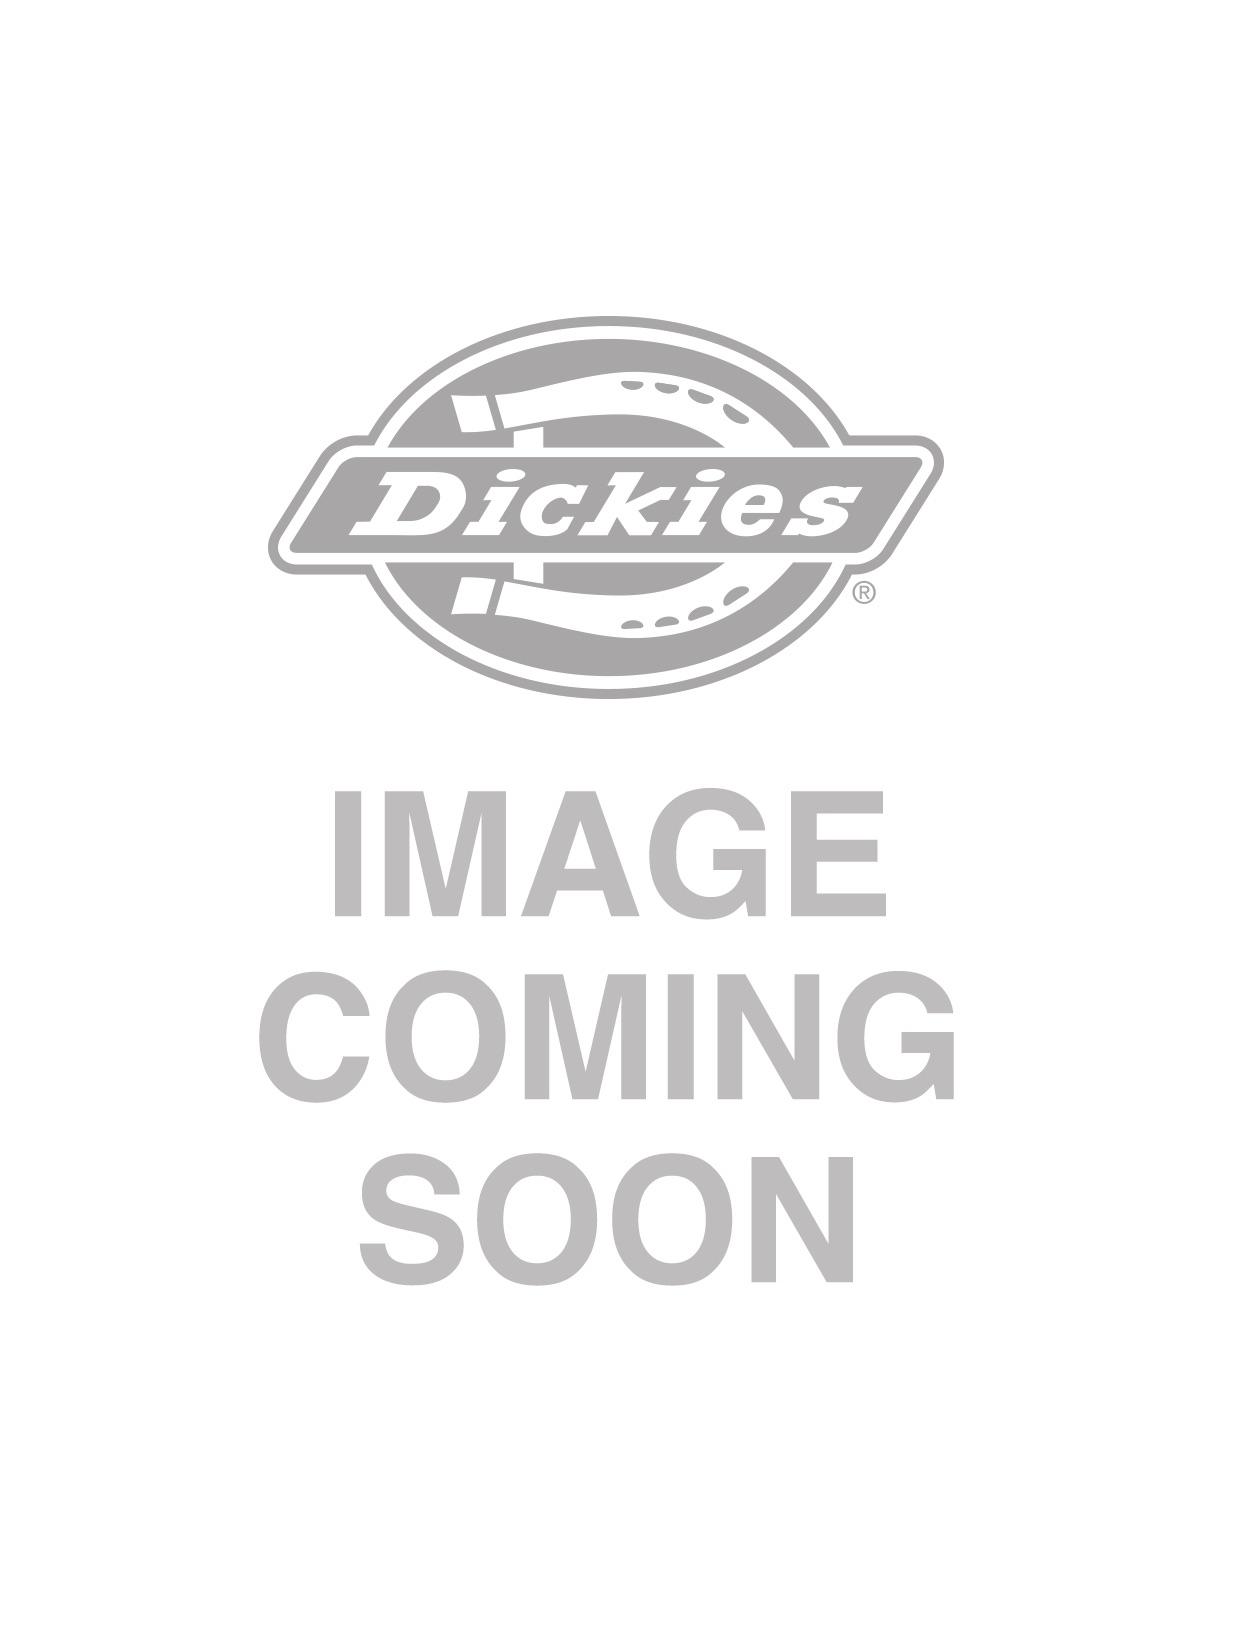 Storden Short Sleeve T-Shirt